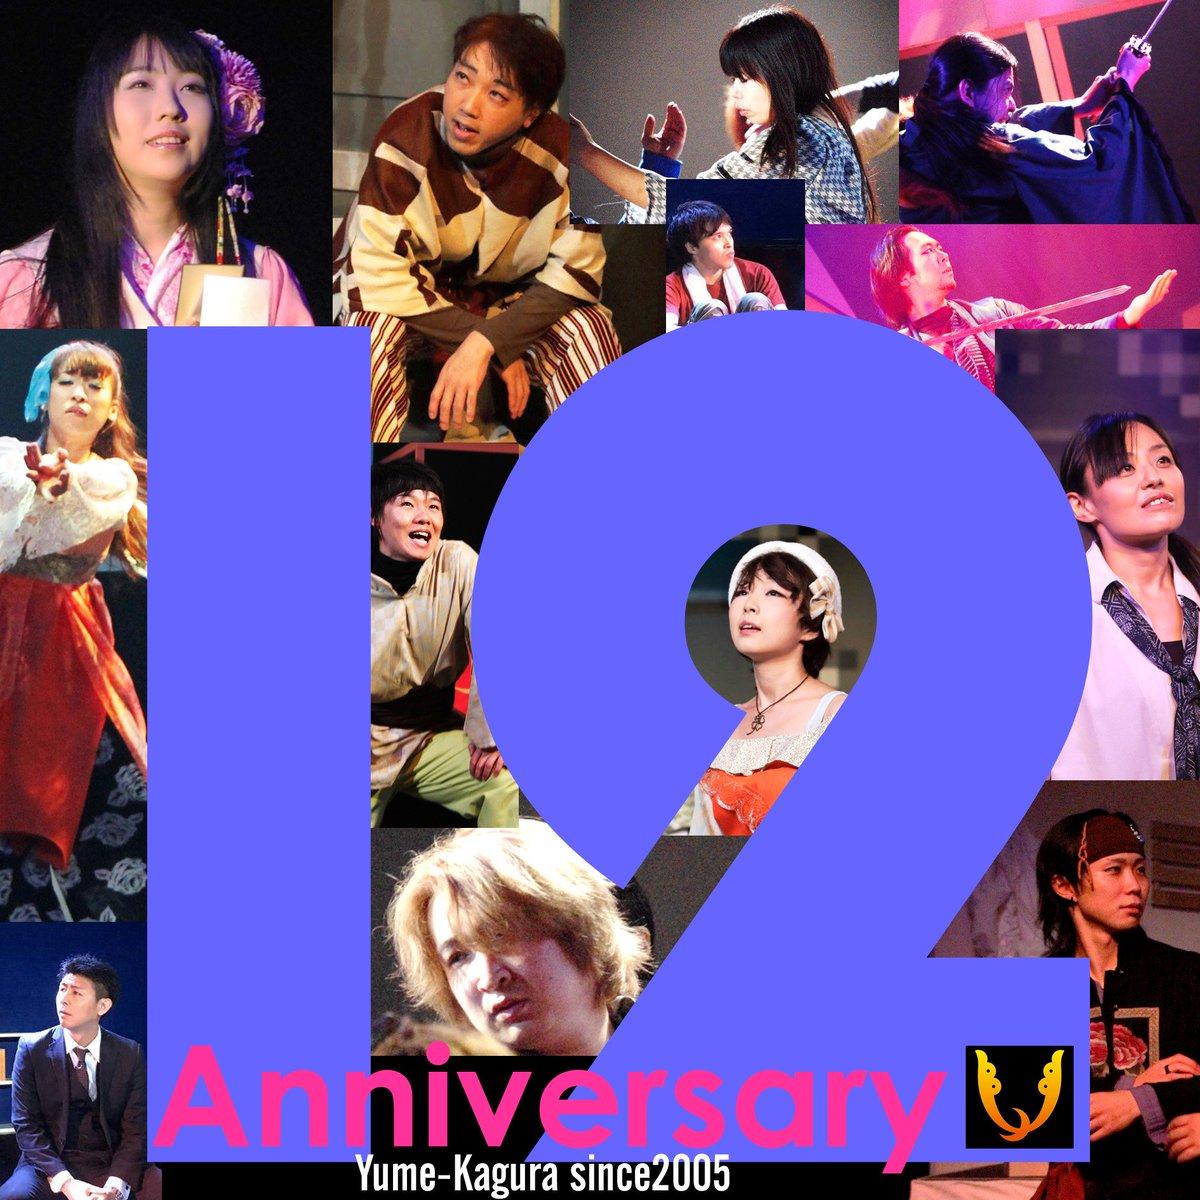 Retweeted 桐乃 睦 ():今日は夢神楽の誕生日です。12歳。13年目に突入です。